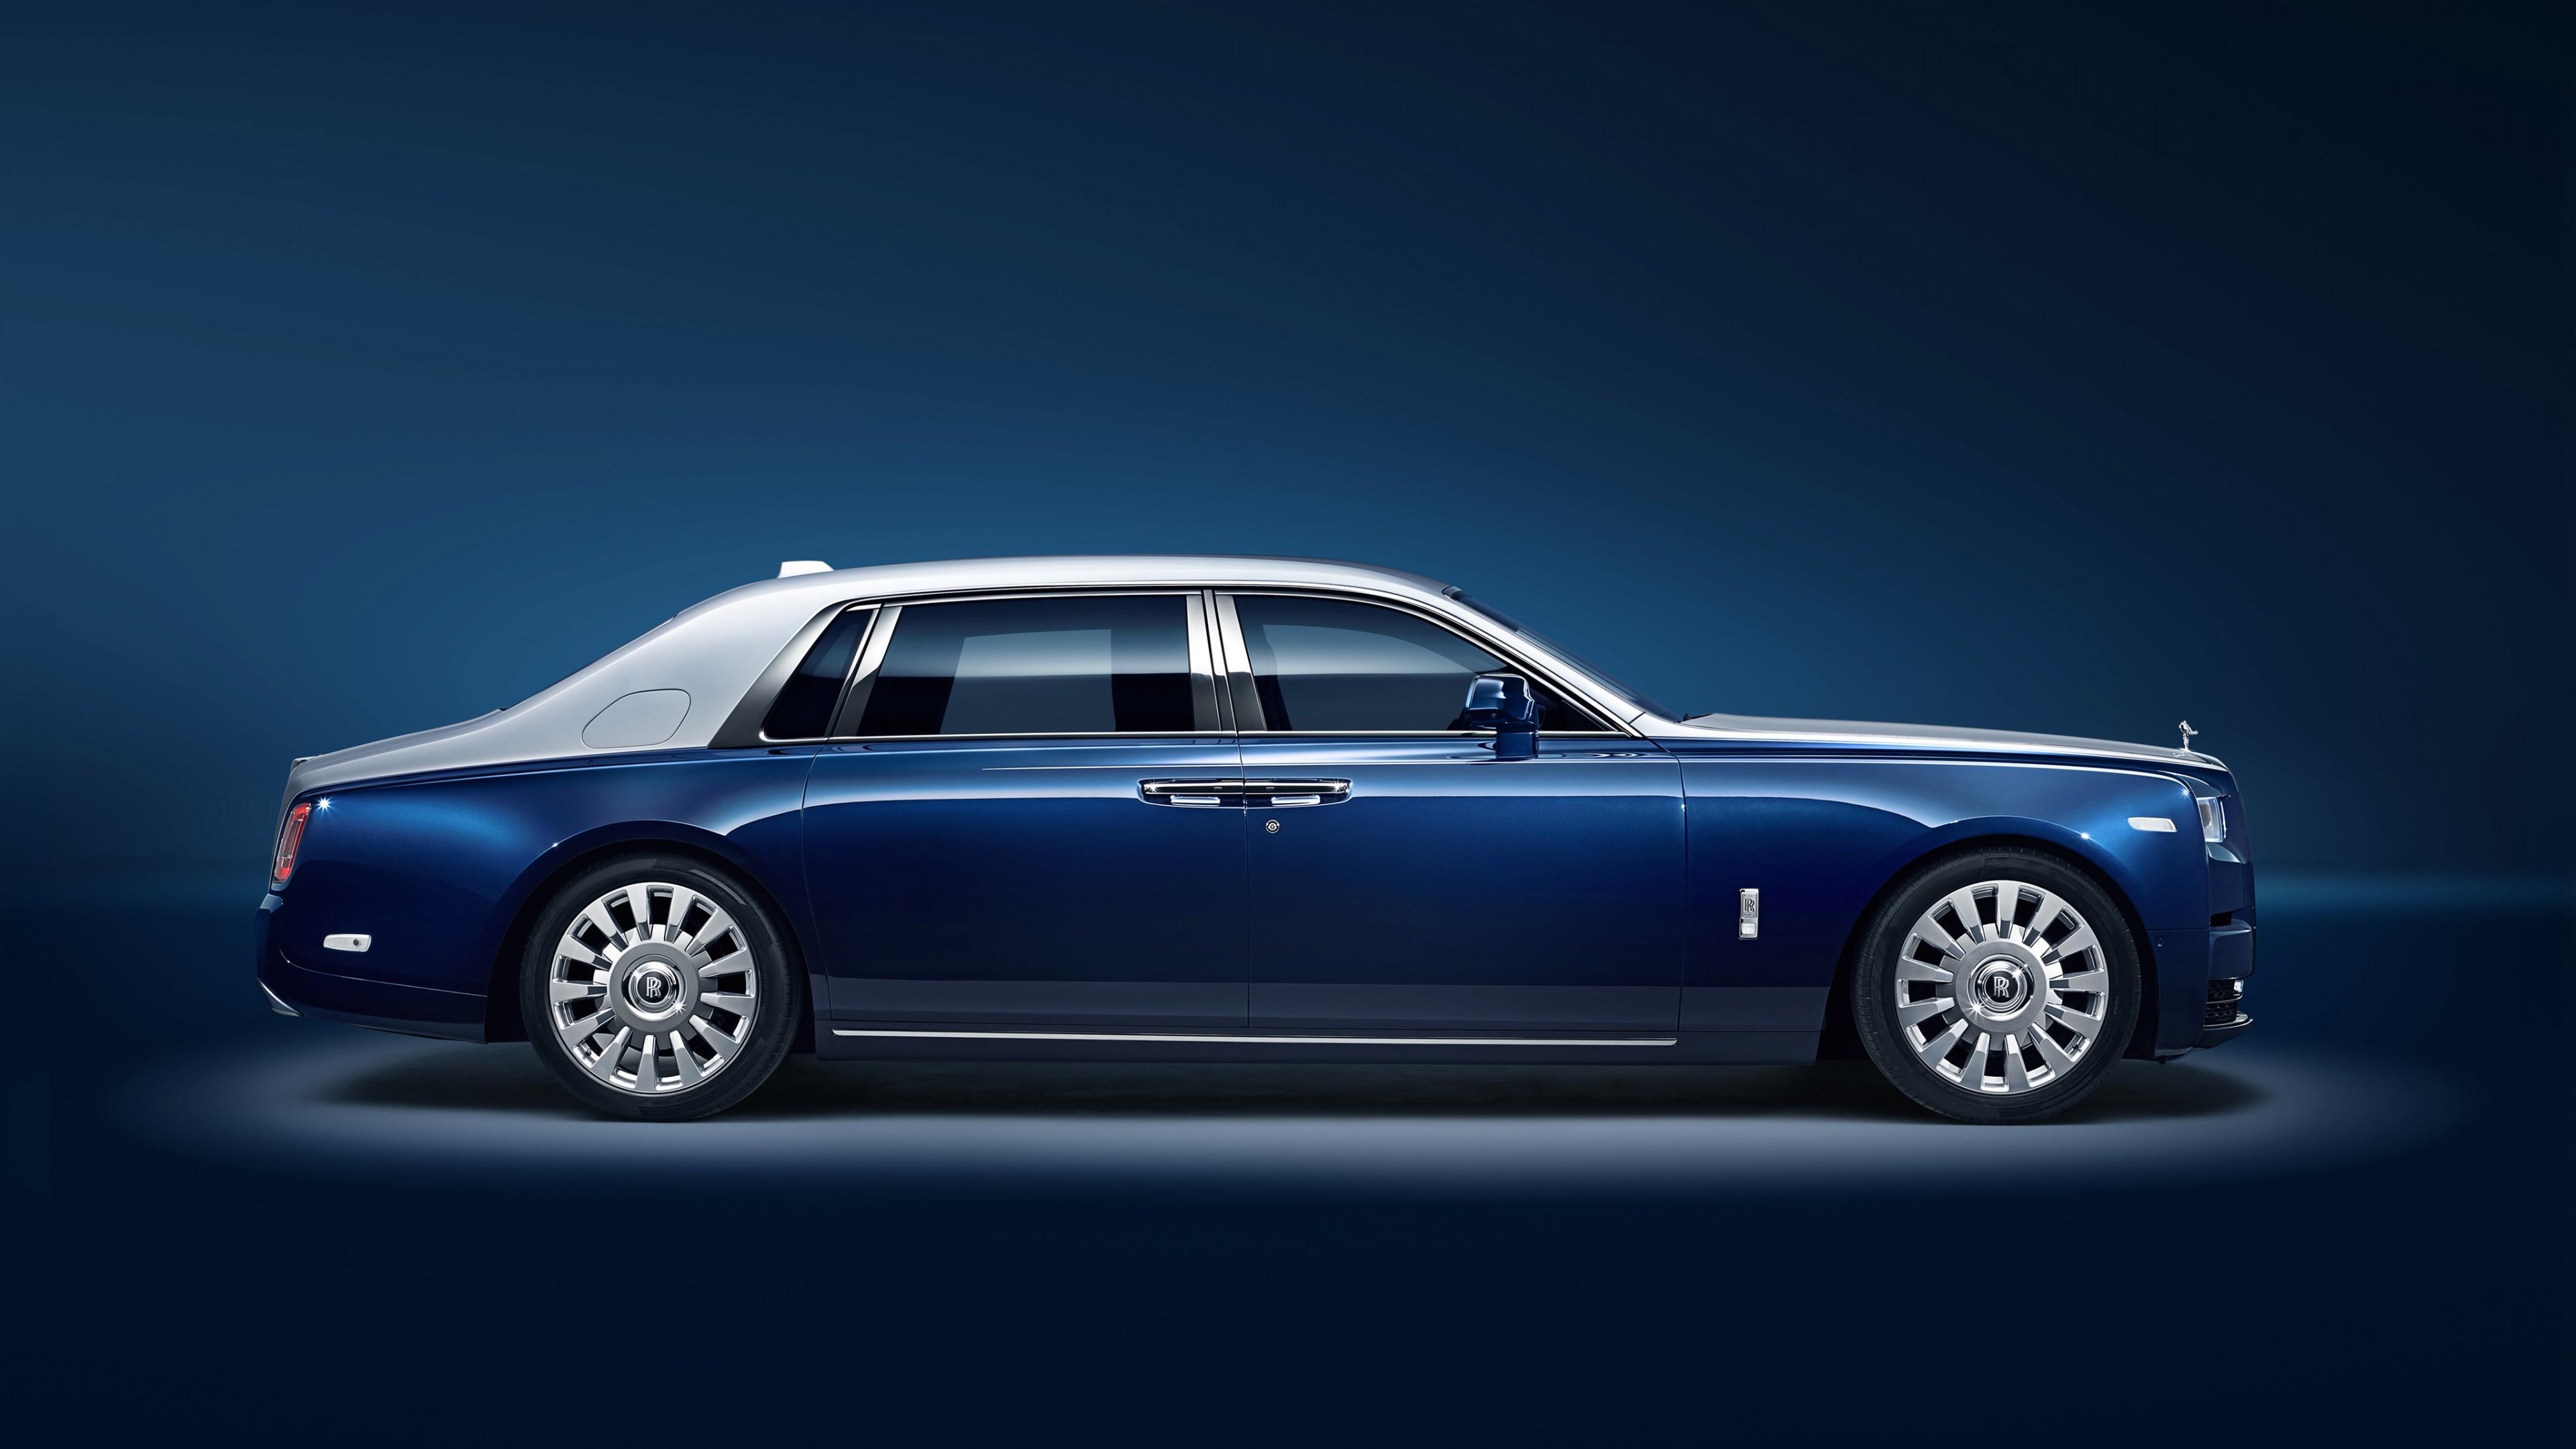 Rolls Royce Phantom Ewb Chengdu 2018 4k Wallpaper Hd Car